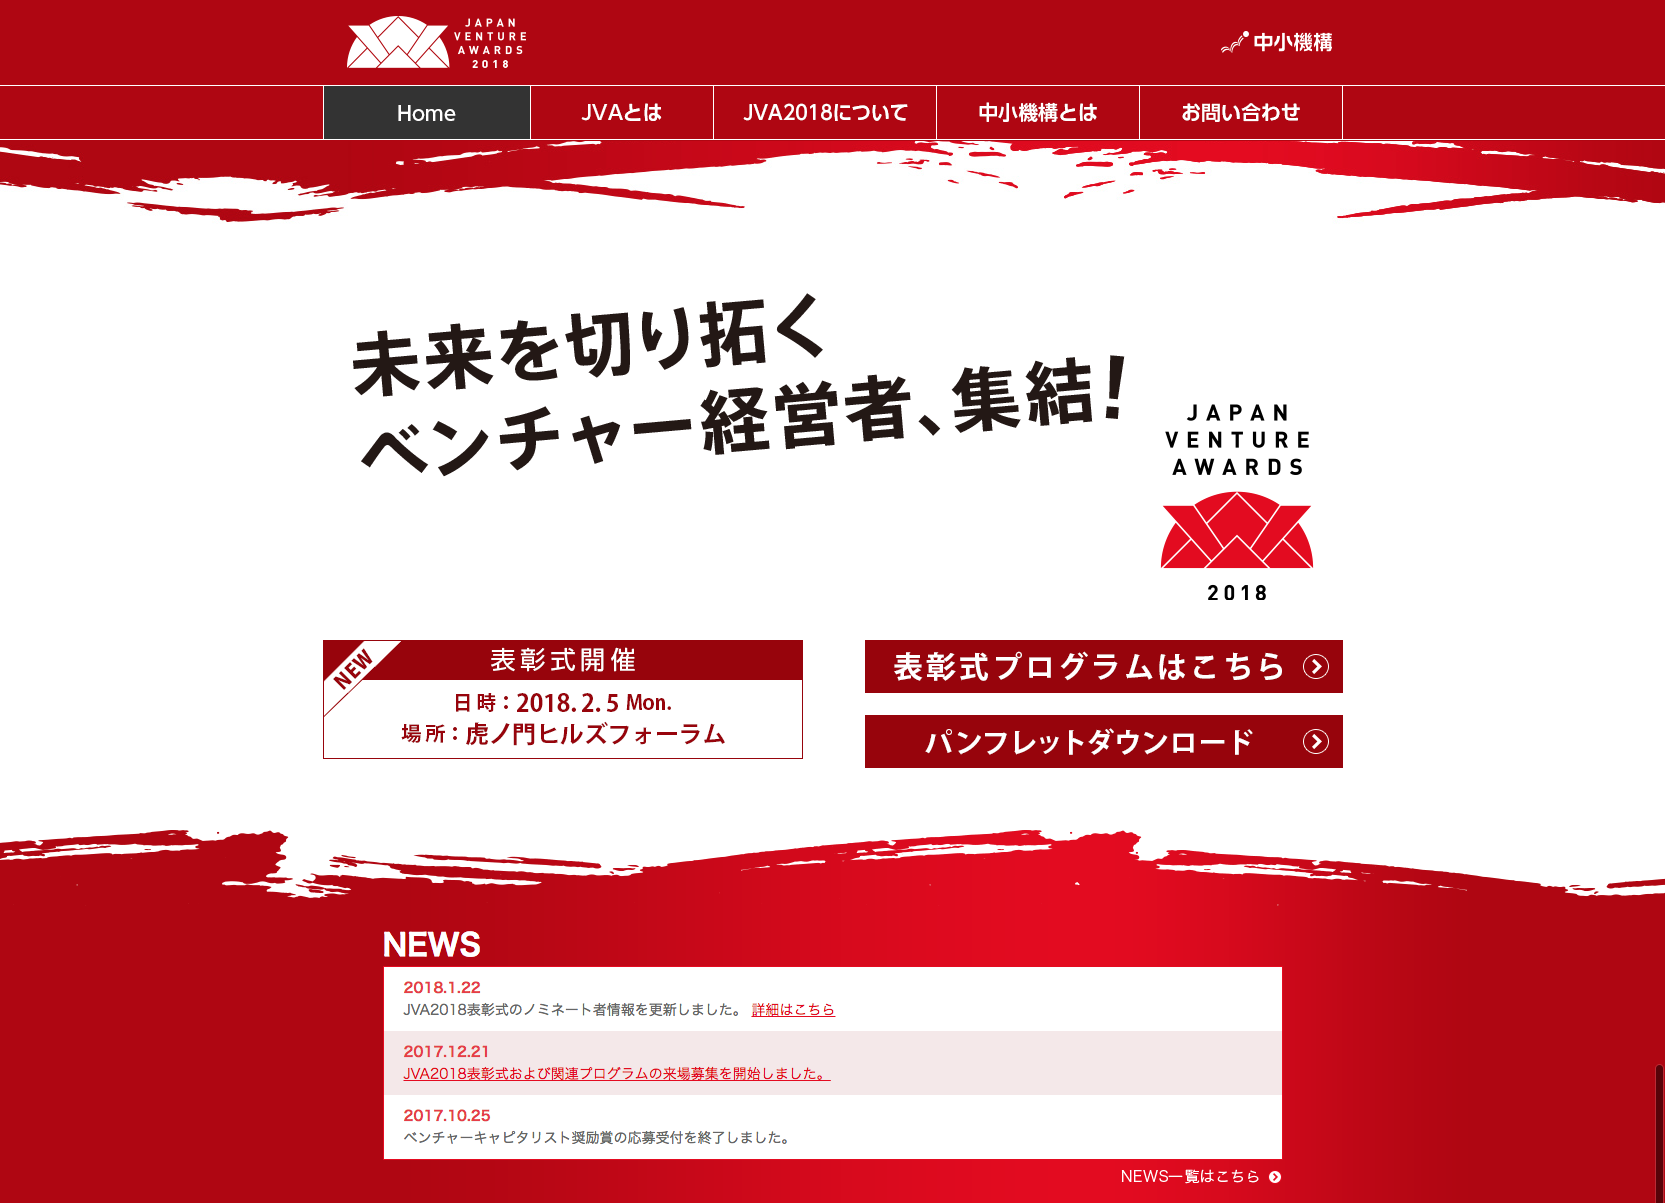 image_1_ABC